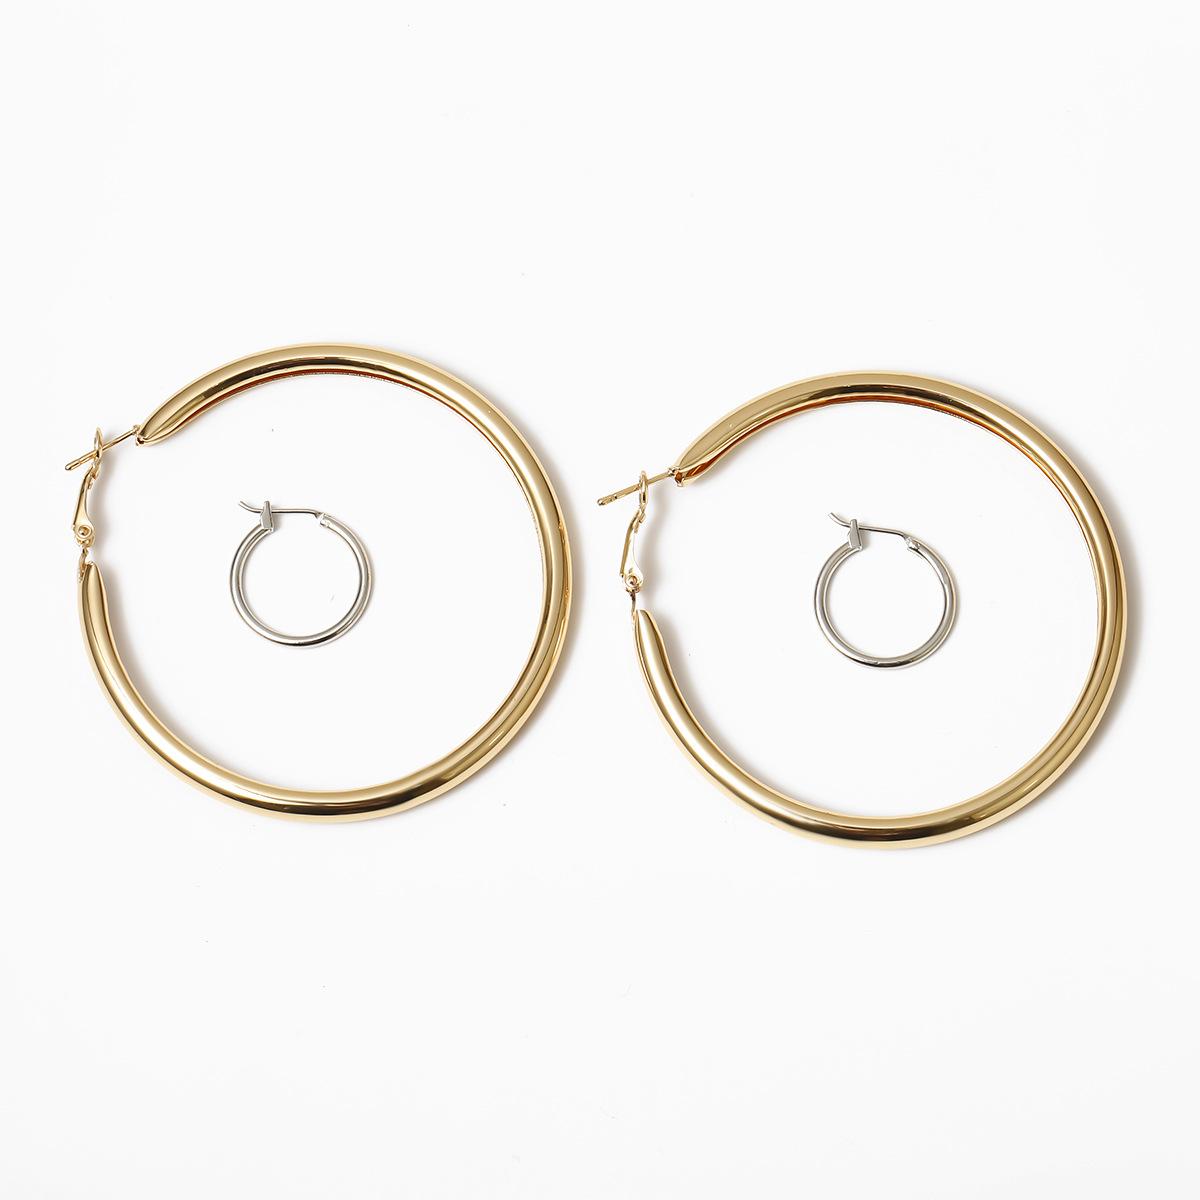 Jewelry simple mixed color earrings for women retro geometric ring earrings NHXR203564